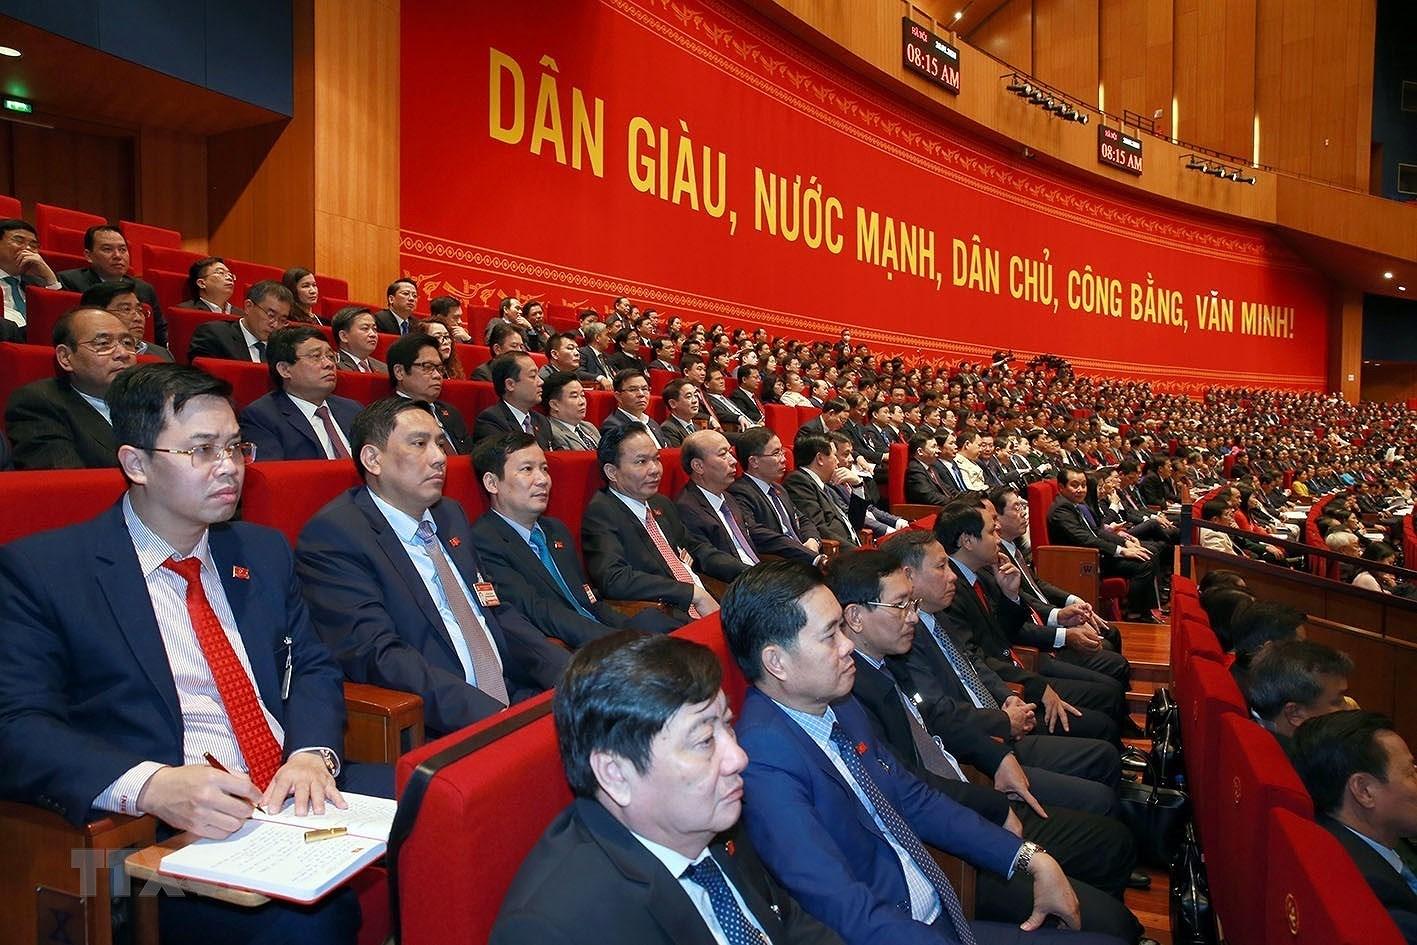 [Photo] Quang canh phien thao luan cac van kien Dai hoi XIII cua Dang hinh anh 28